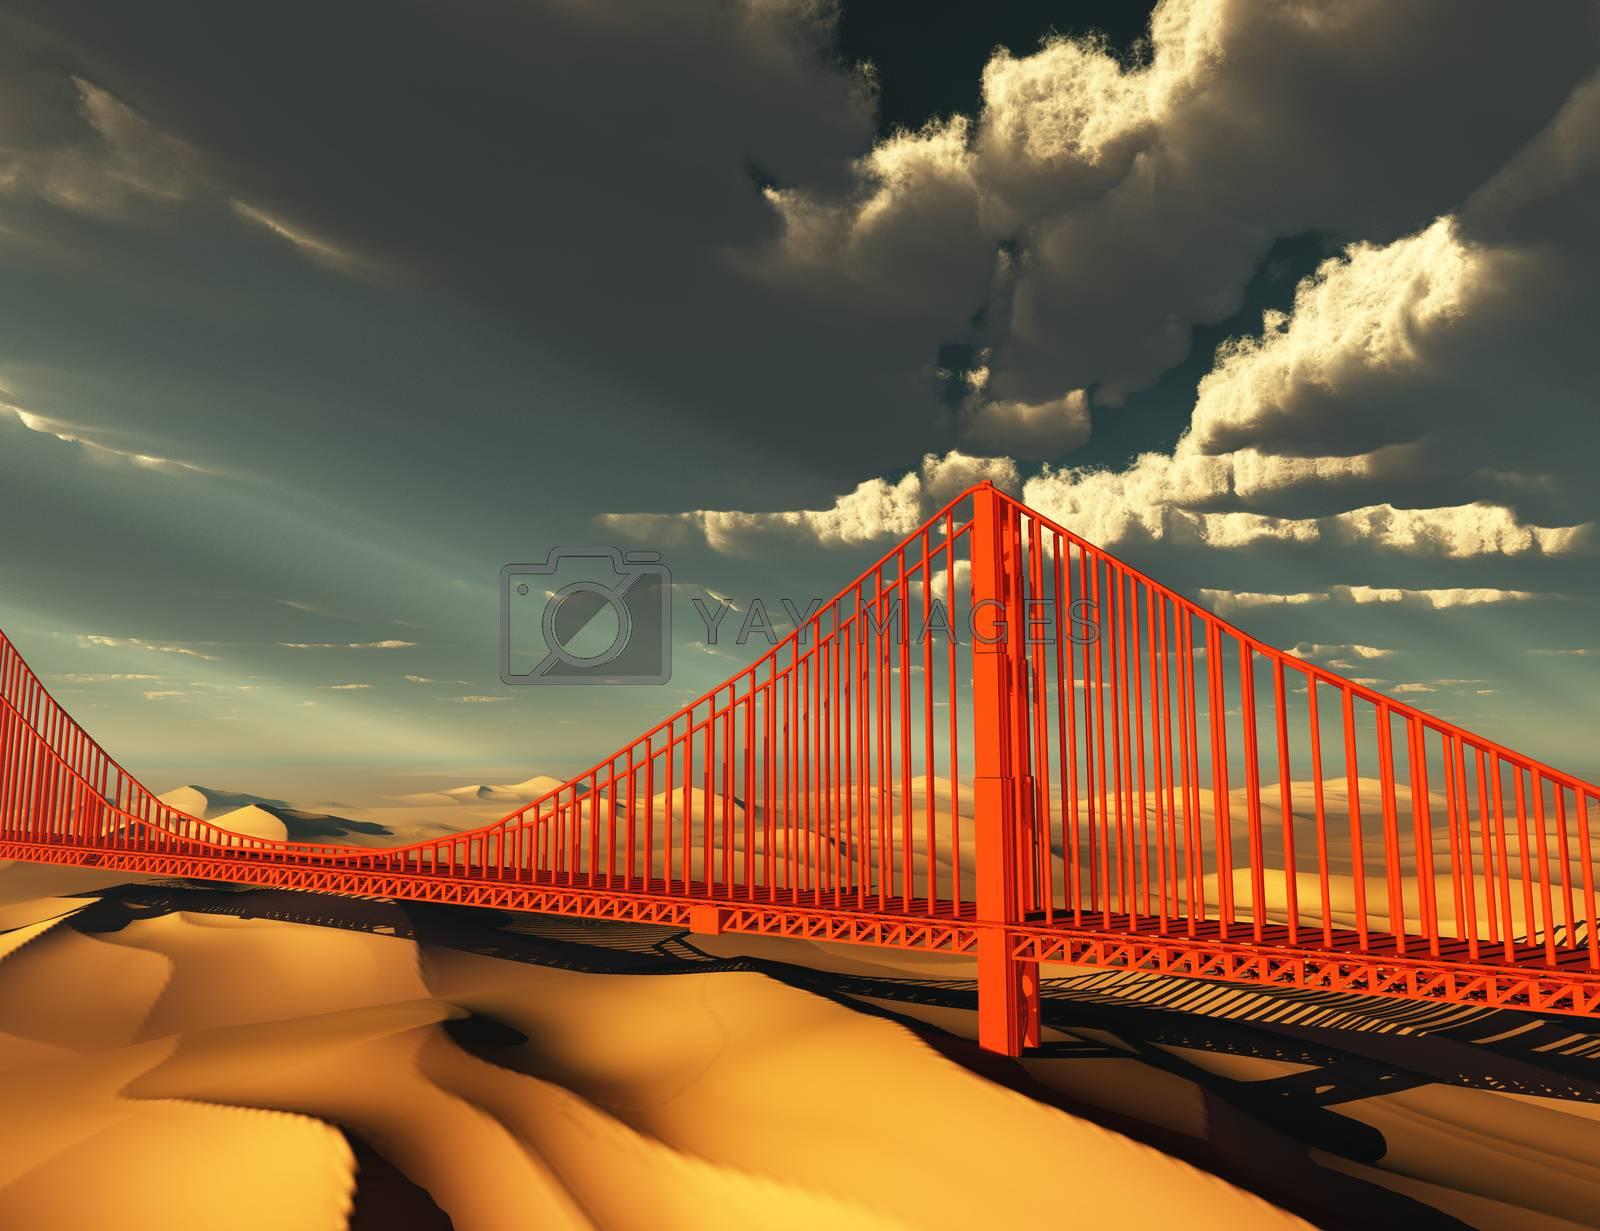 Golden Gate Bridge in desolate future